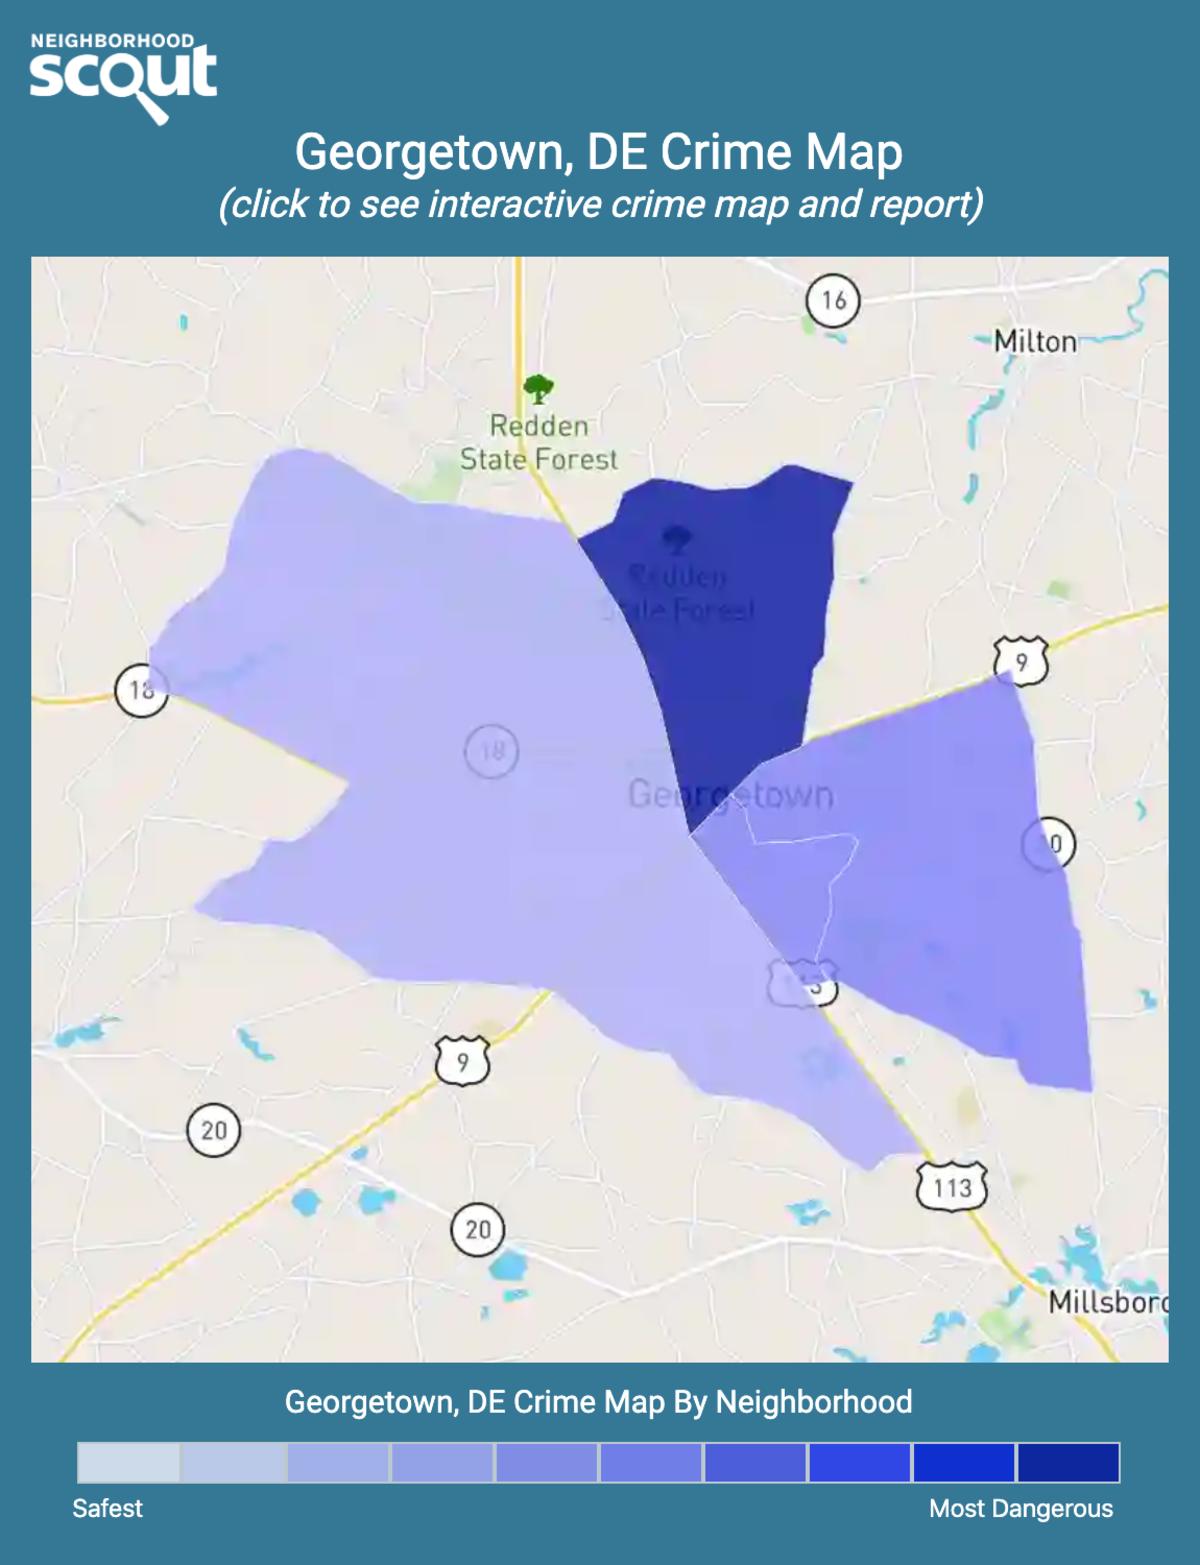 Georgetown, Delaware crime map